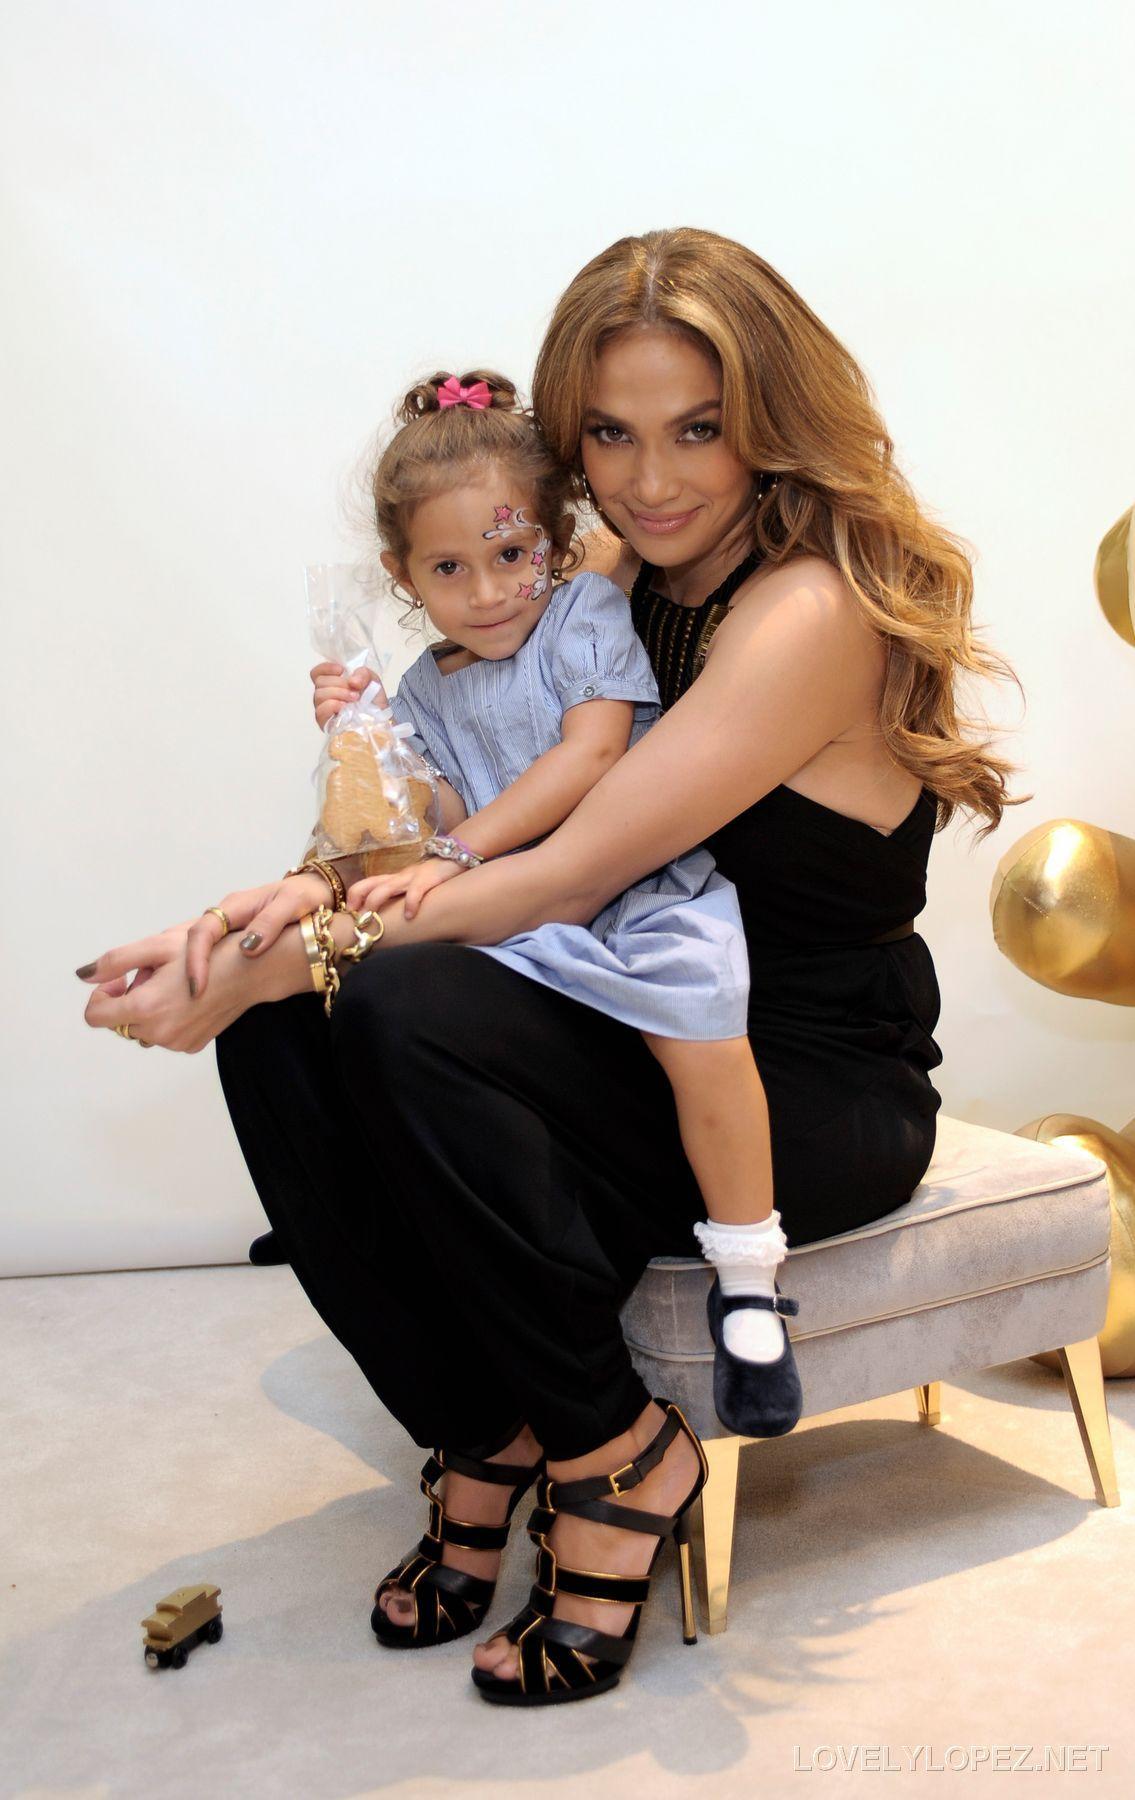 Дженнифер Лопес/Jennifer Lopez - Страница 5 Gucci-And-Jennifer-Lopez-Celebrate-Gucci-Children-s-Collection-jennifer-lopez-17235230-1135-1800